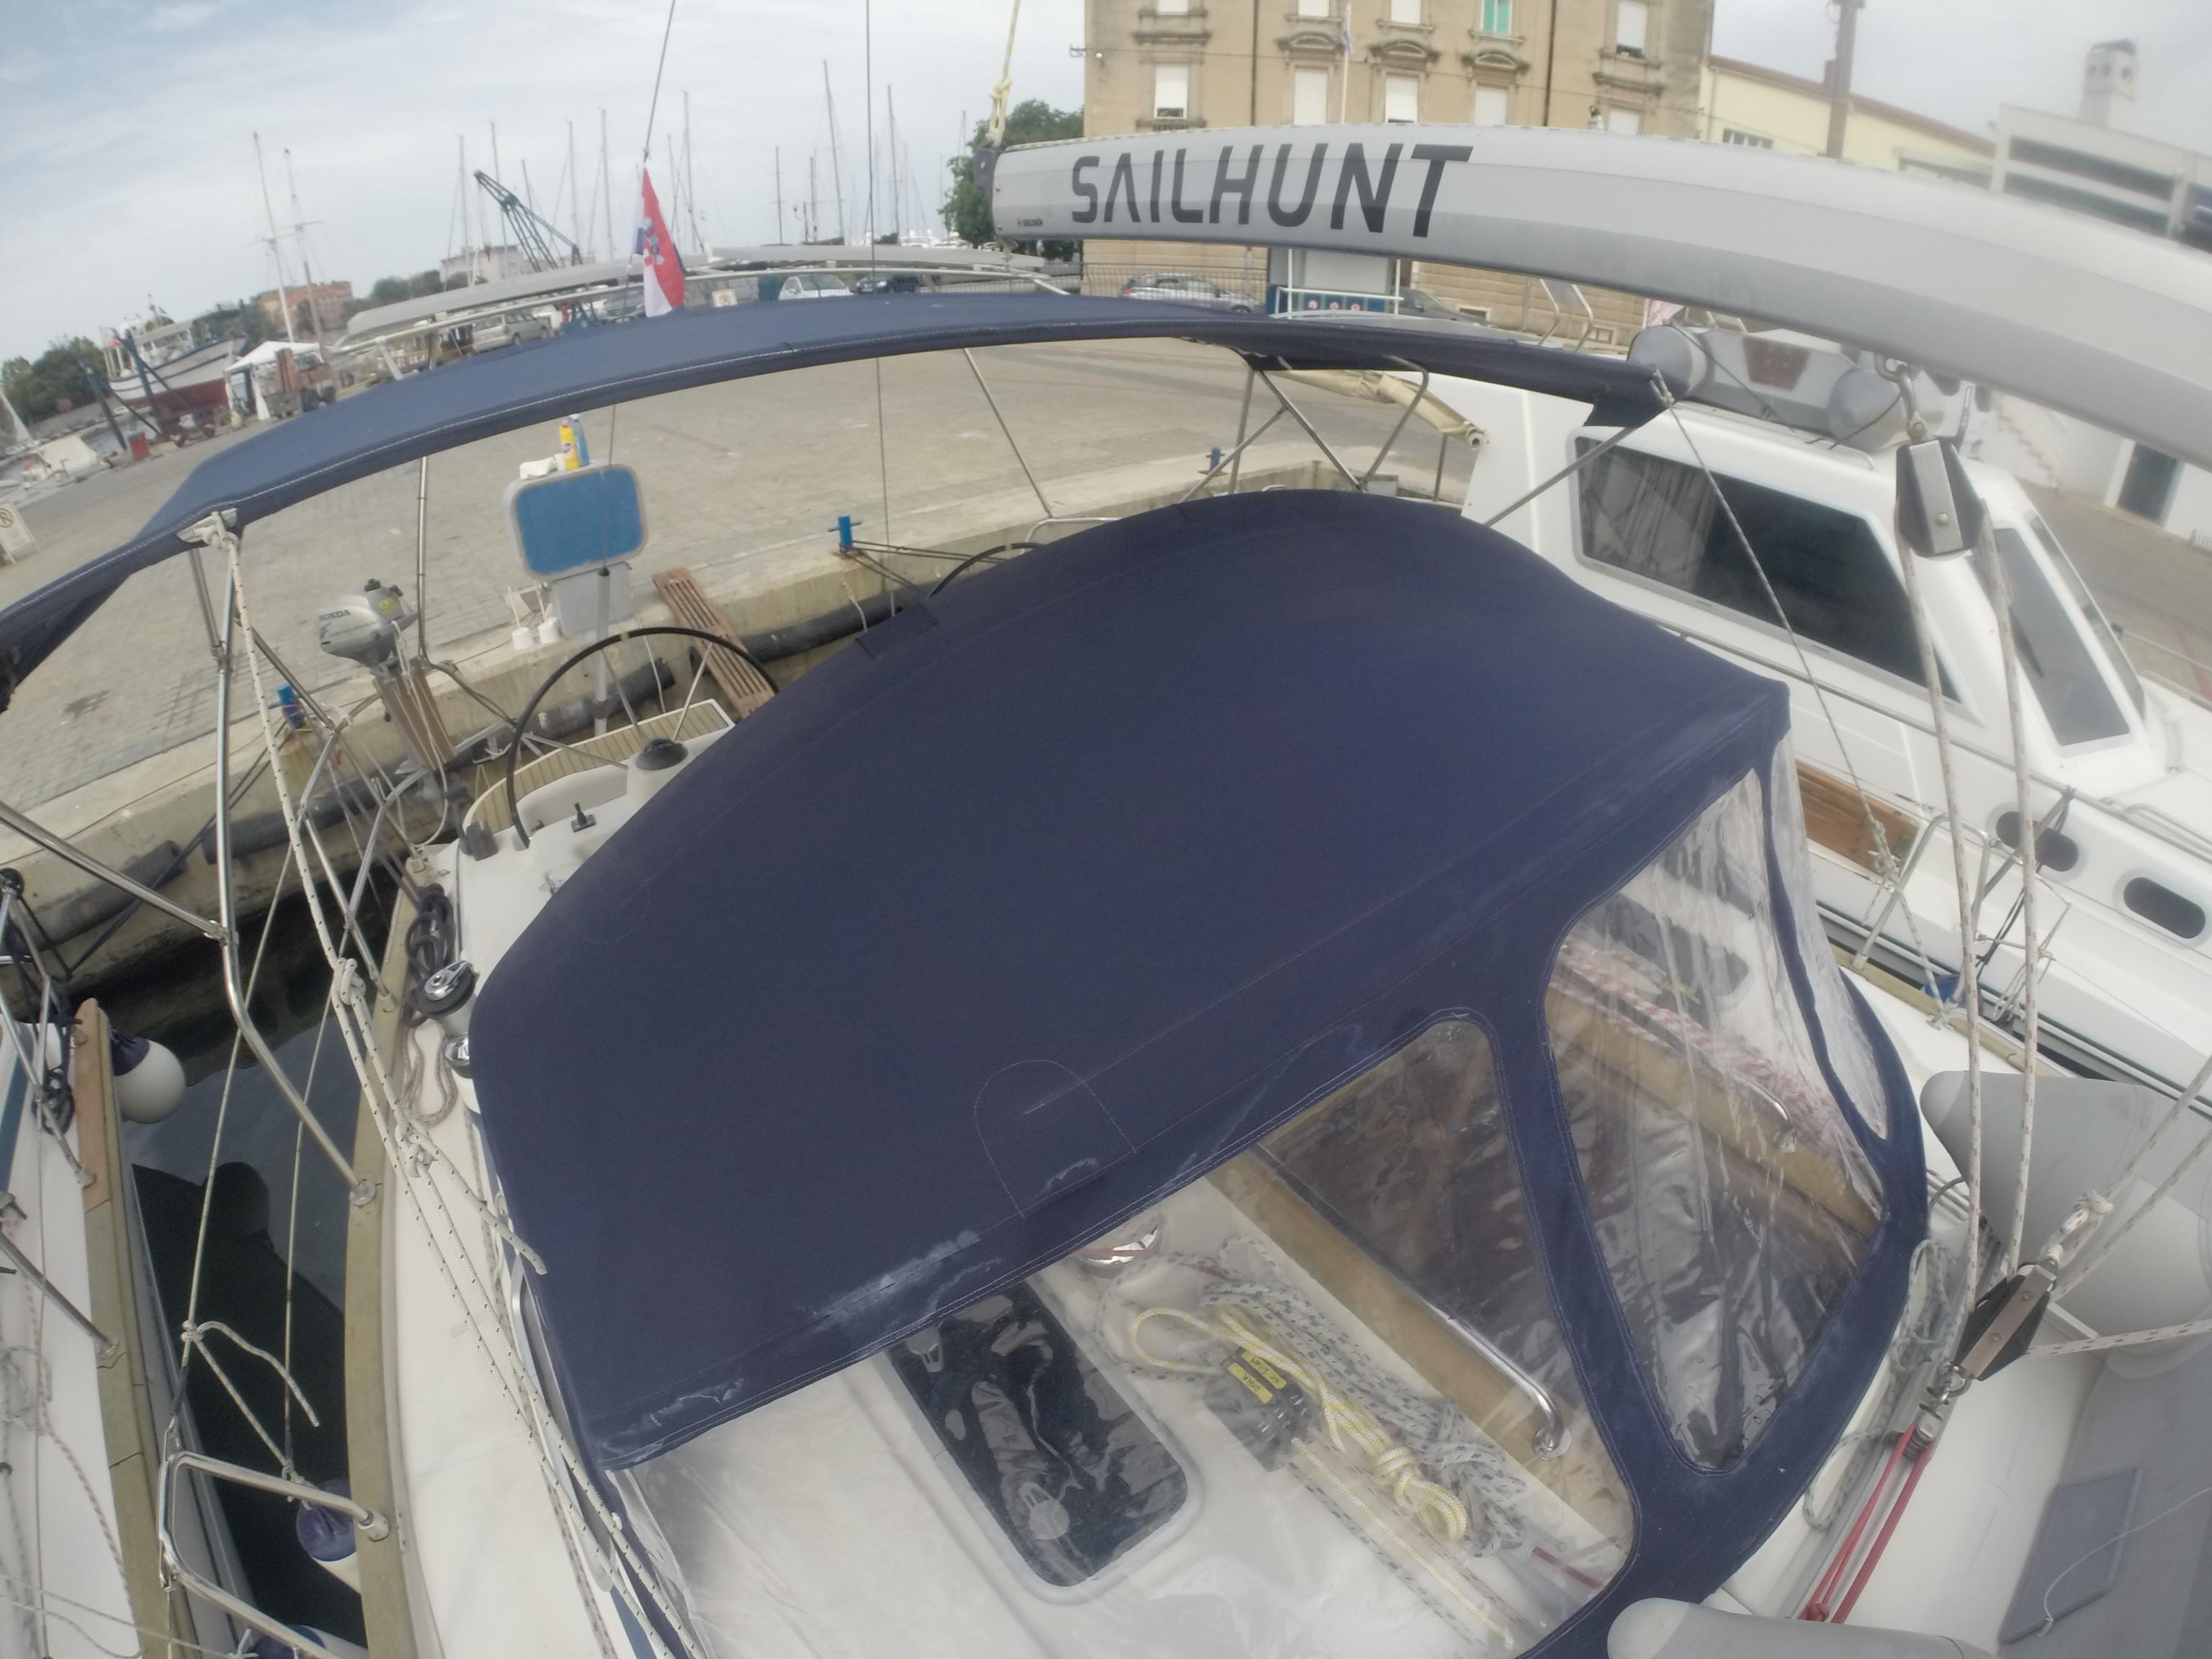 Bavaria 44 (Dišpet - sails 2019/solar panels)  - 48